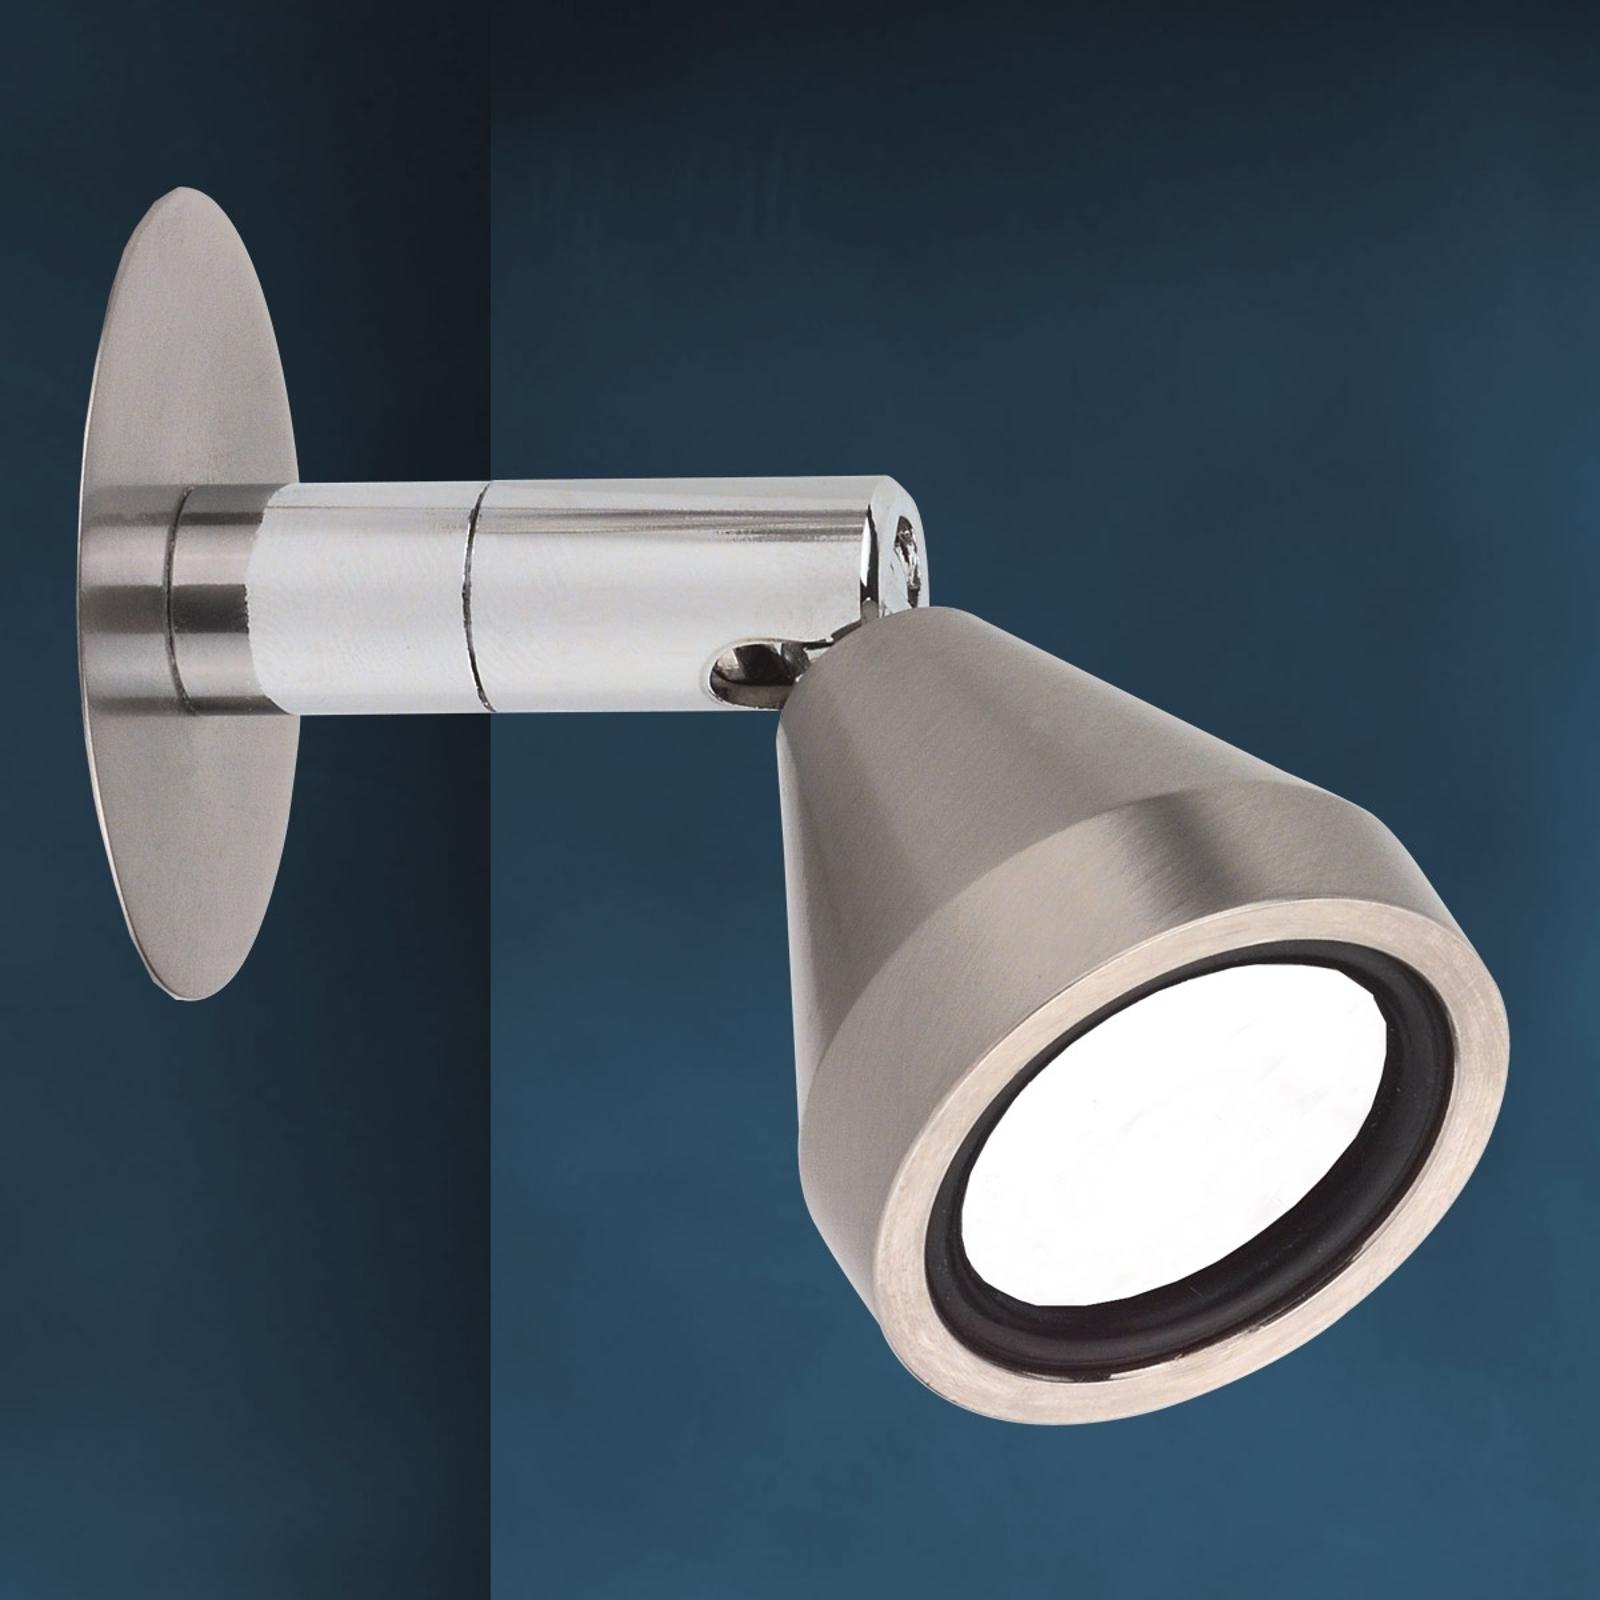 Spot LED semi-incasso MINI, bianco neutro